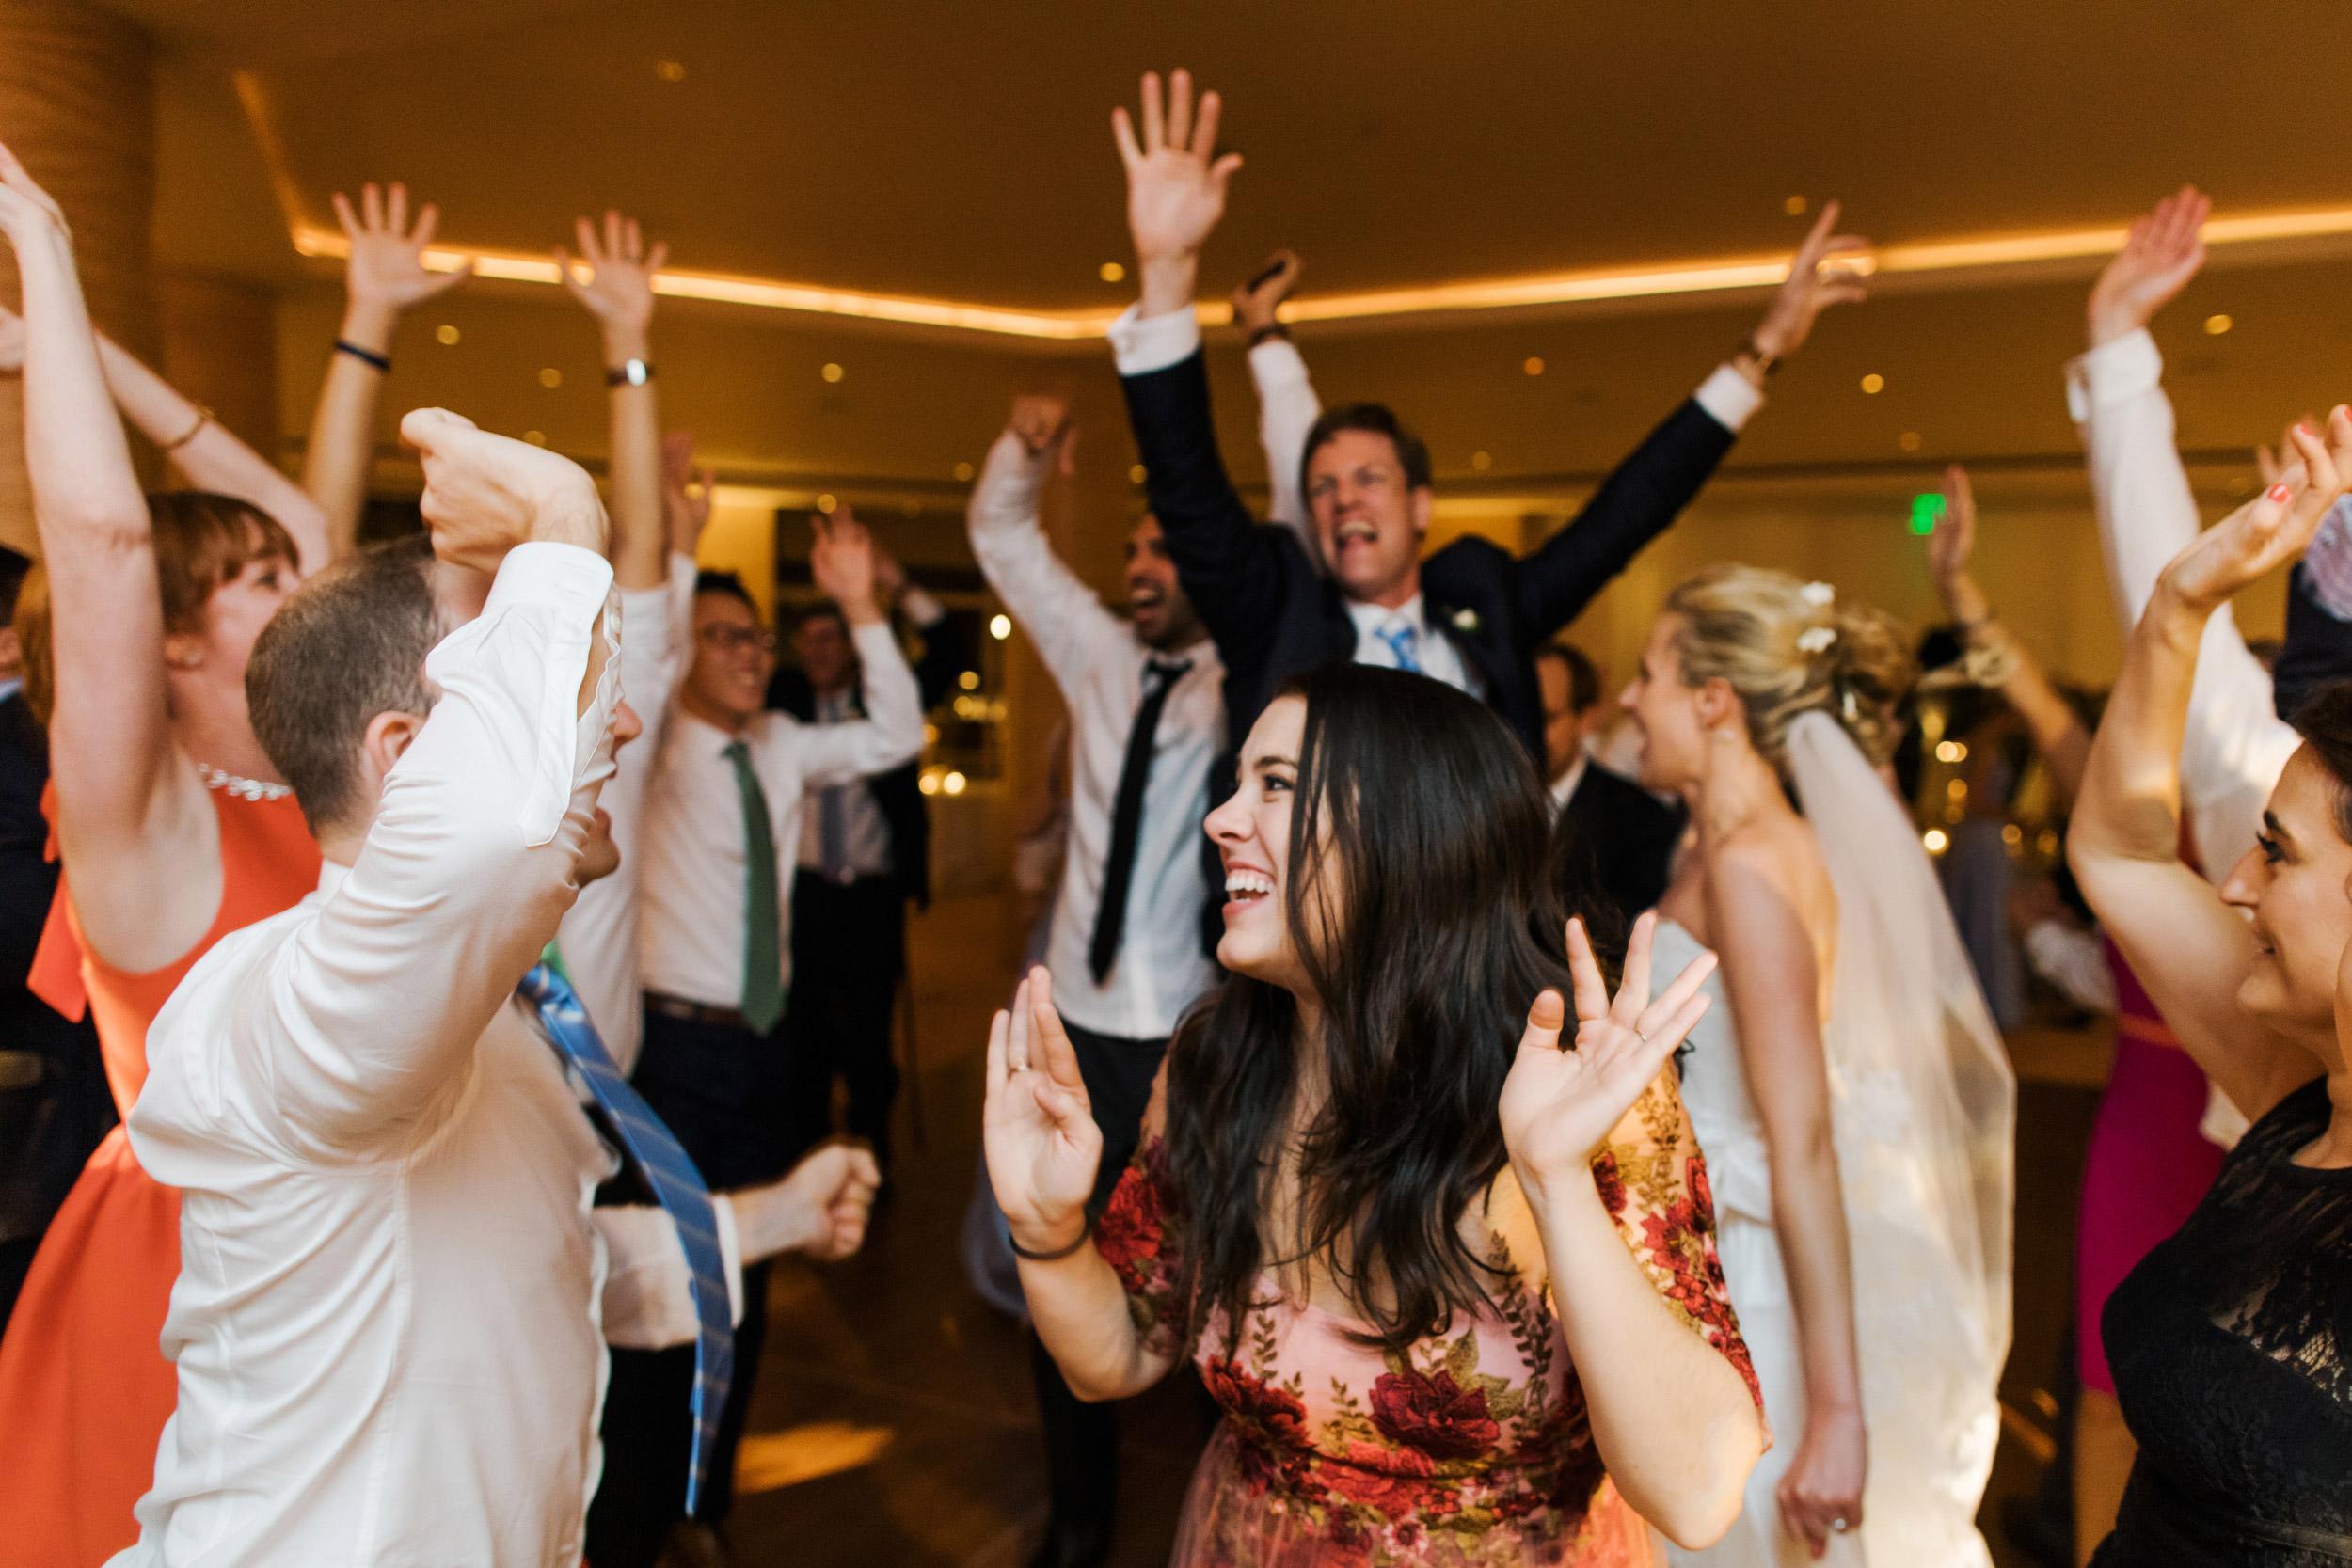 biltmore_santa_barbara_wedding_photos_coral_casino_094.jpg